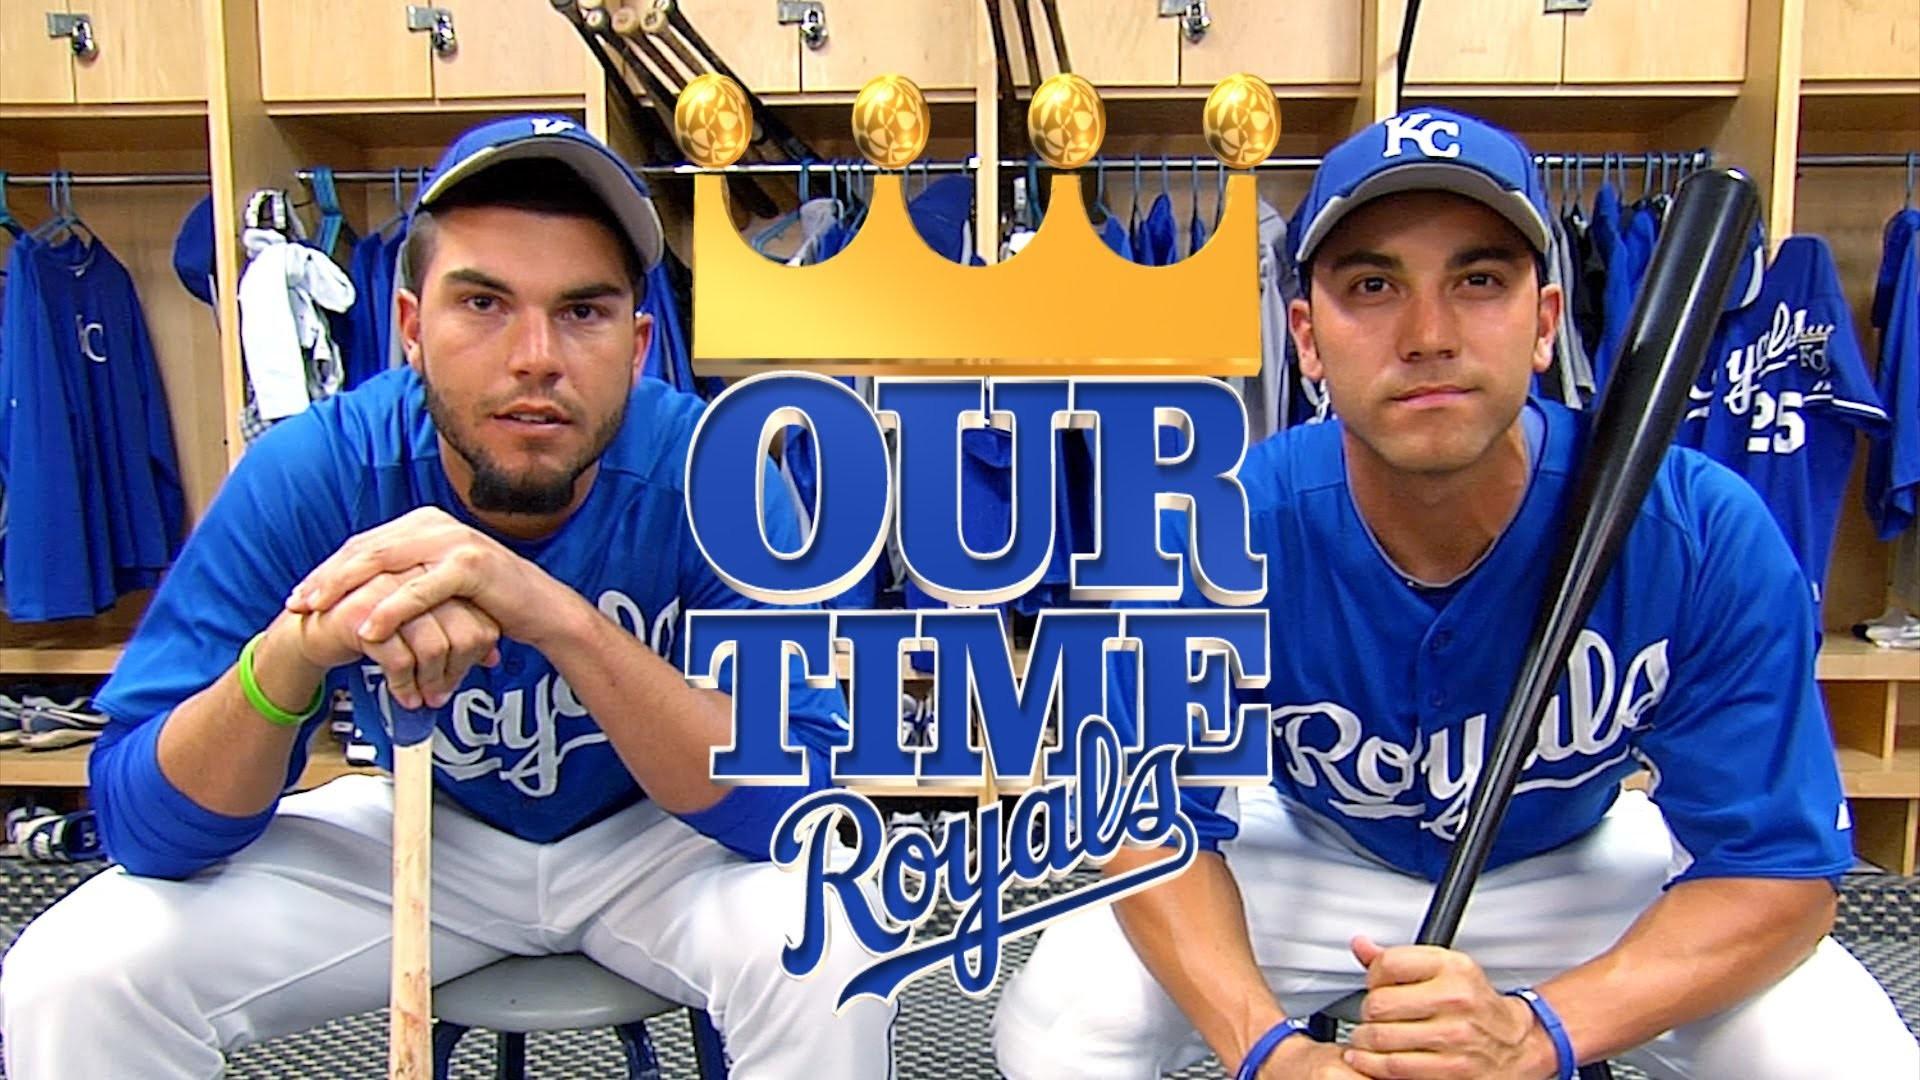 Sport HD Kansas City Royals.